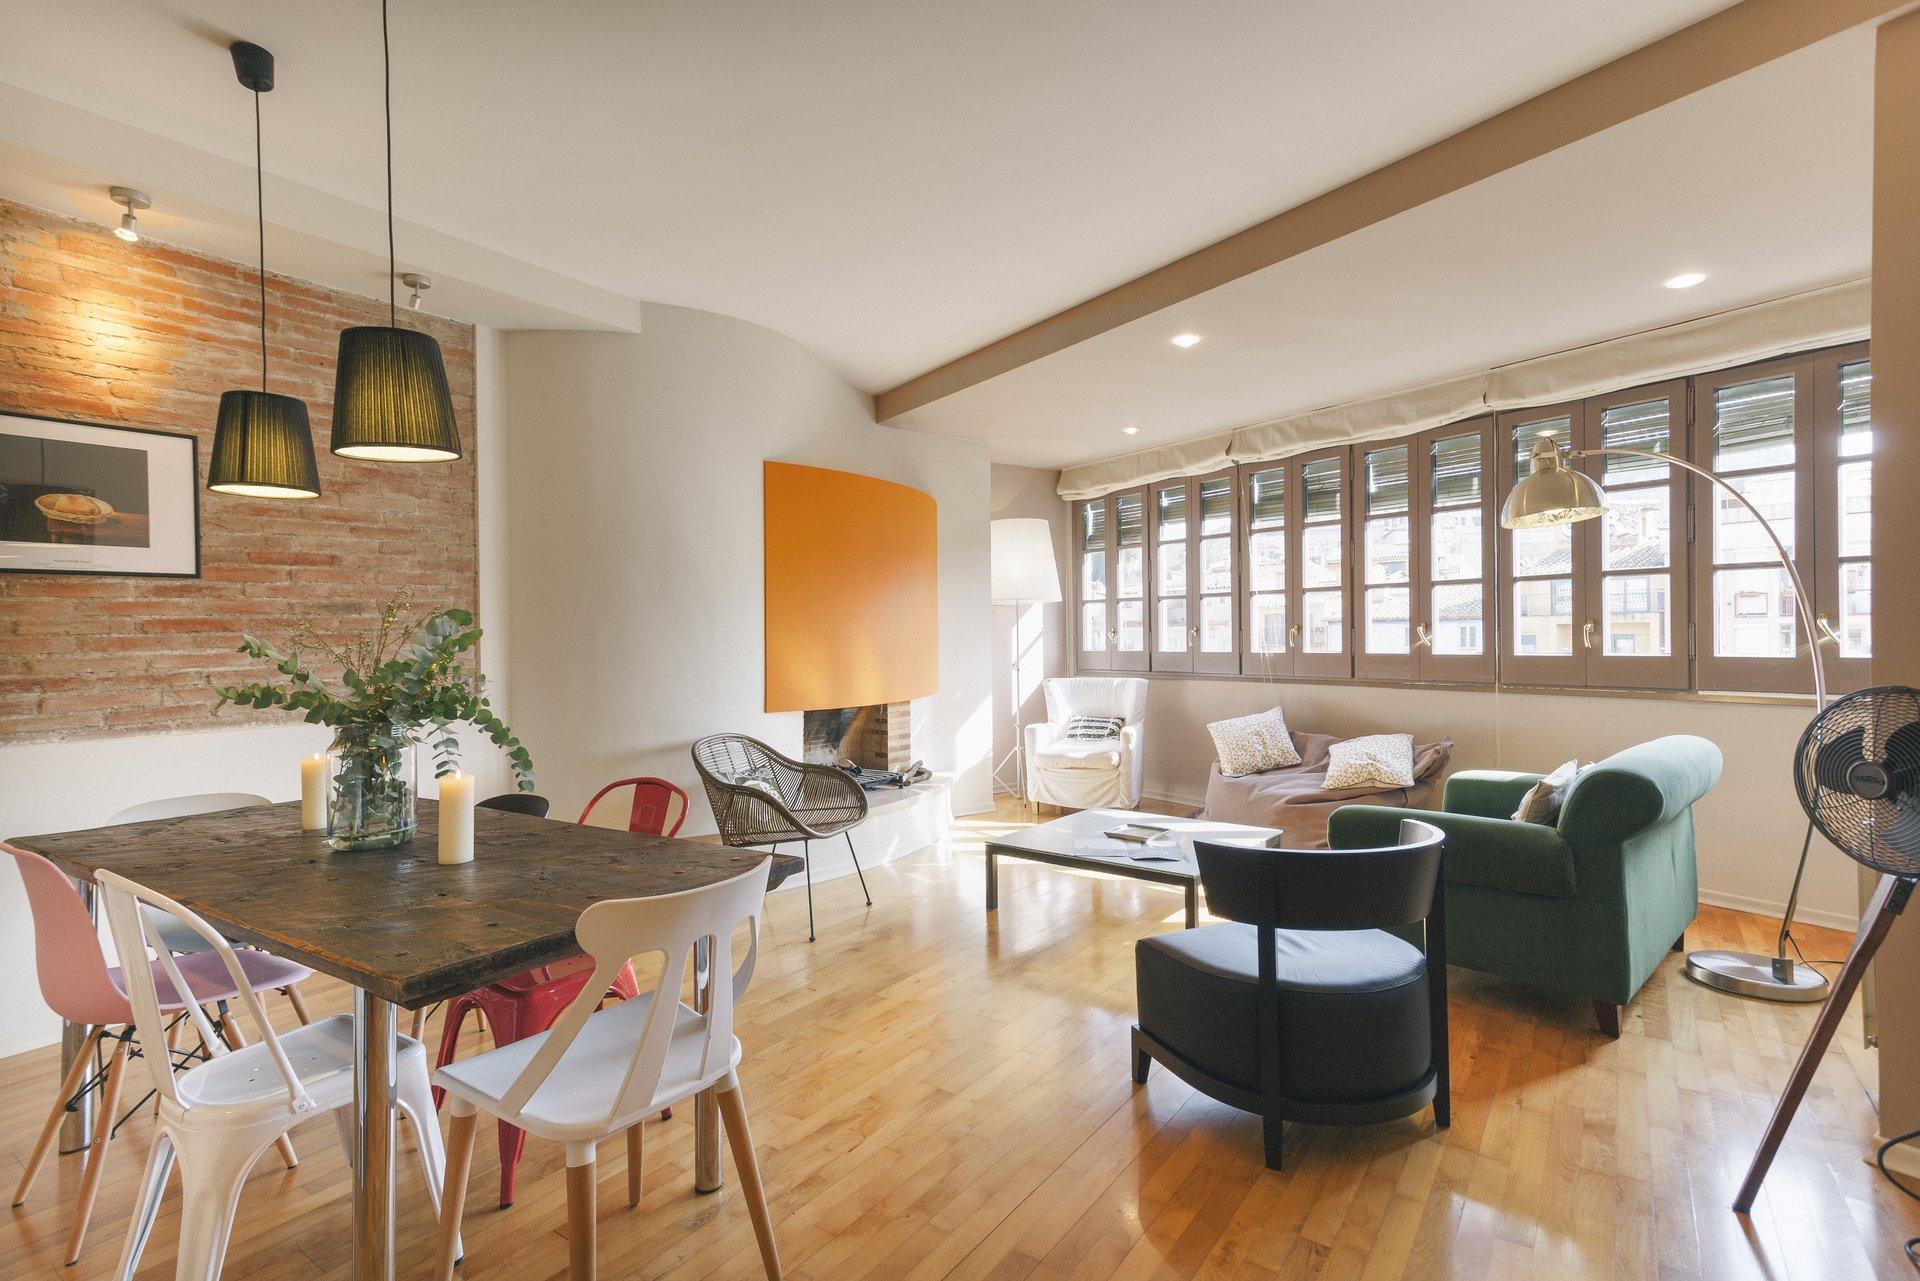 holiday apartment central girona santa clara spainsleep and stay